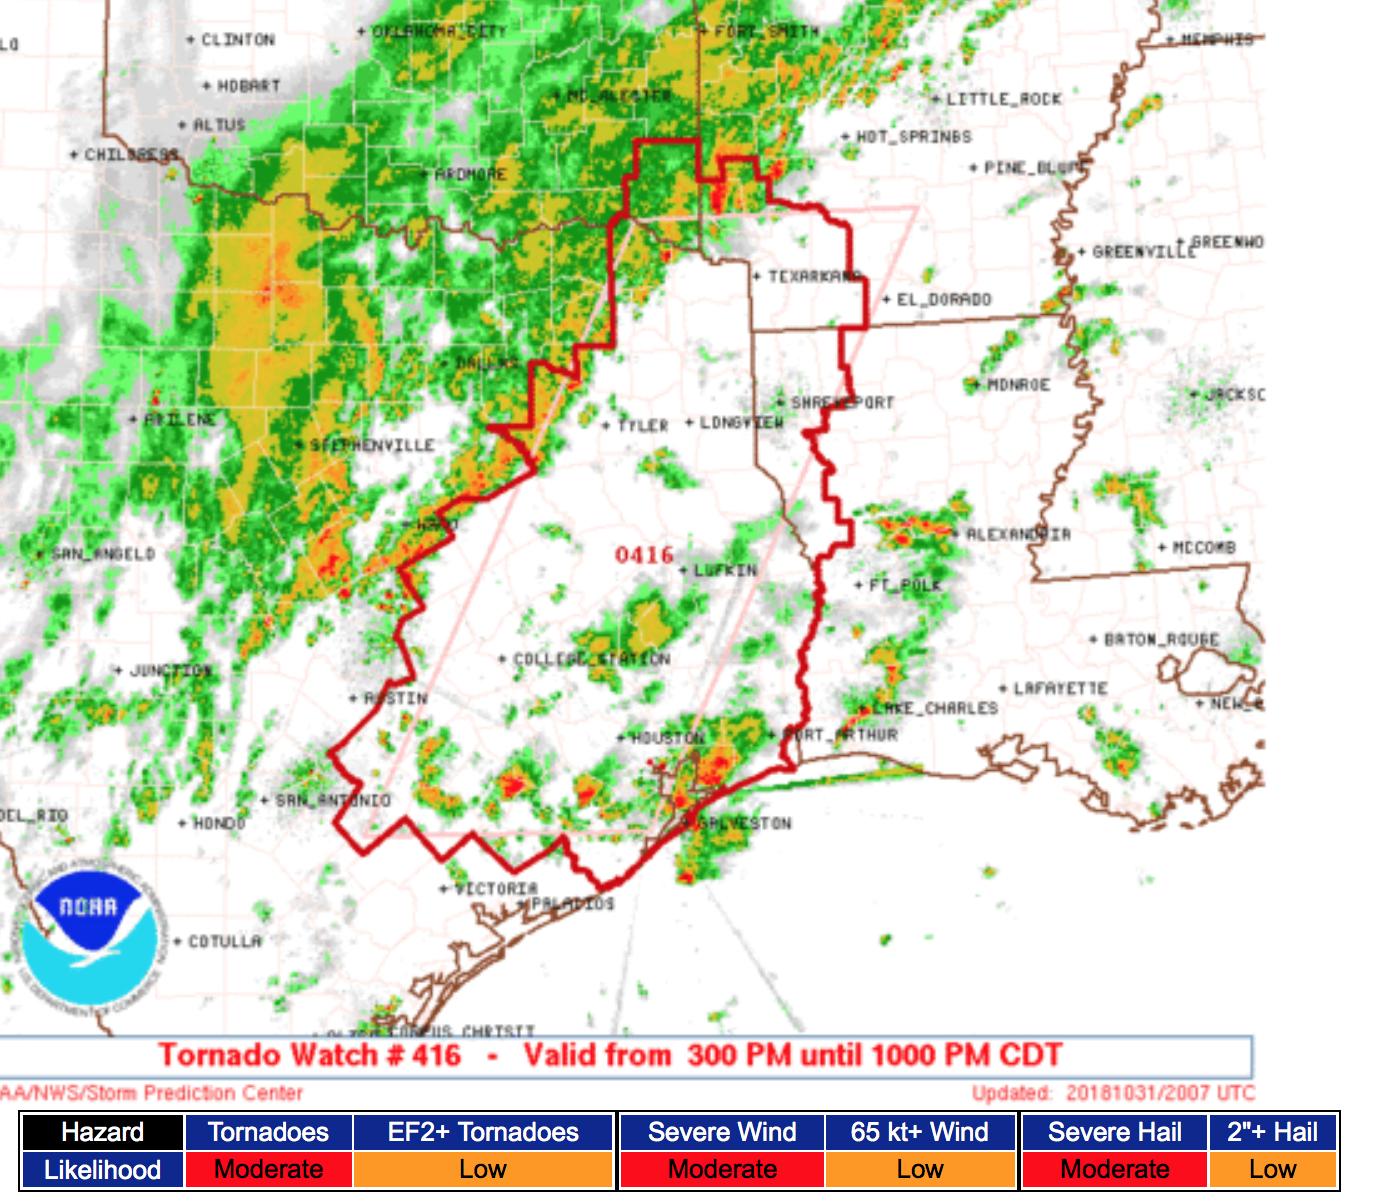 Map Of Texas Oklahoma And Louisiana.Mse Creative Consulting Blog Tornado Watch E Texas W Louisiana